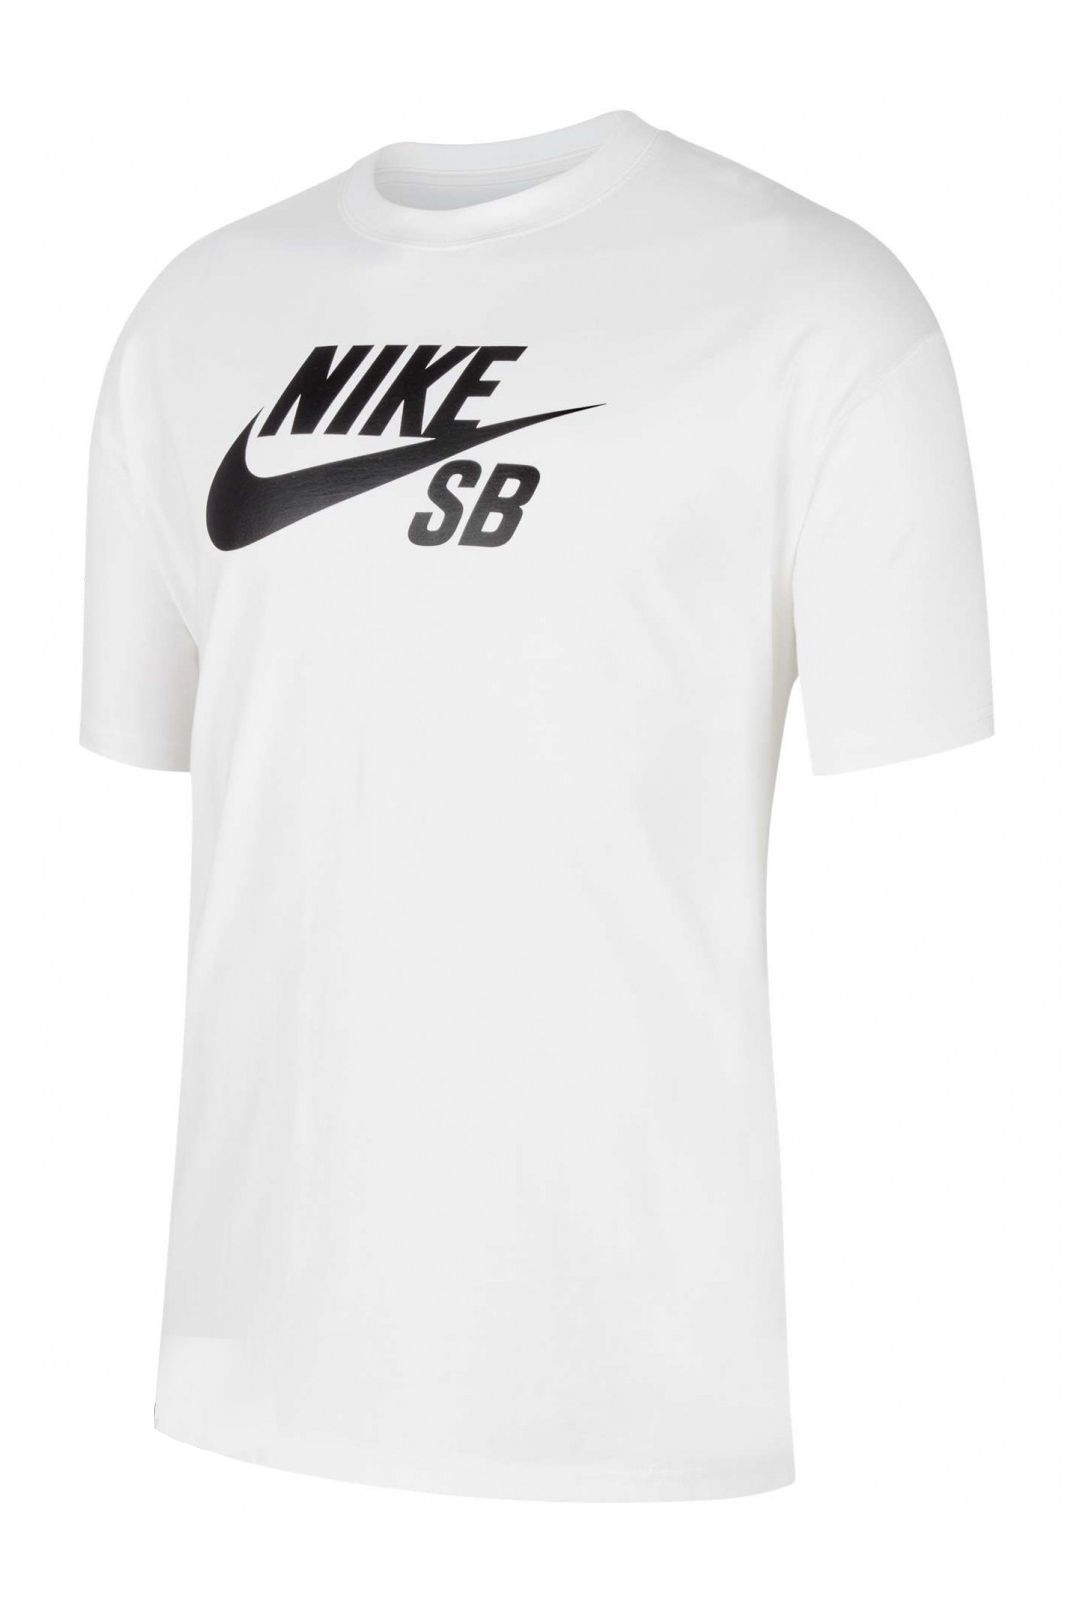 T-Shirt Nike Sb LOGO White/(Black)